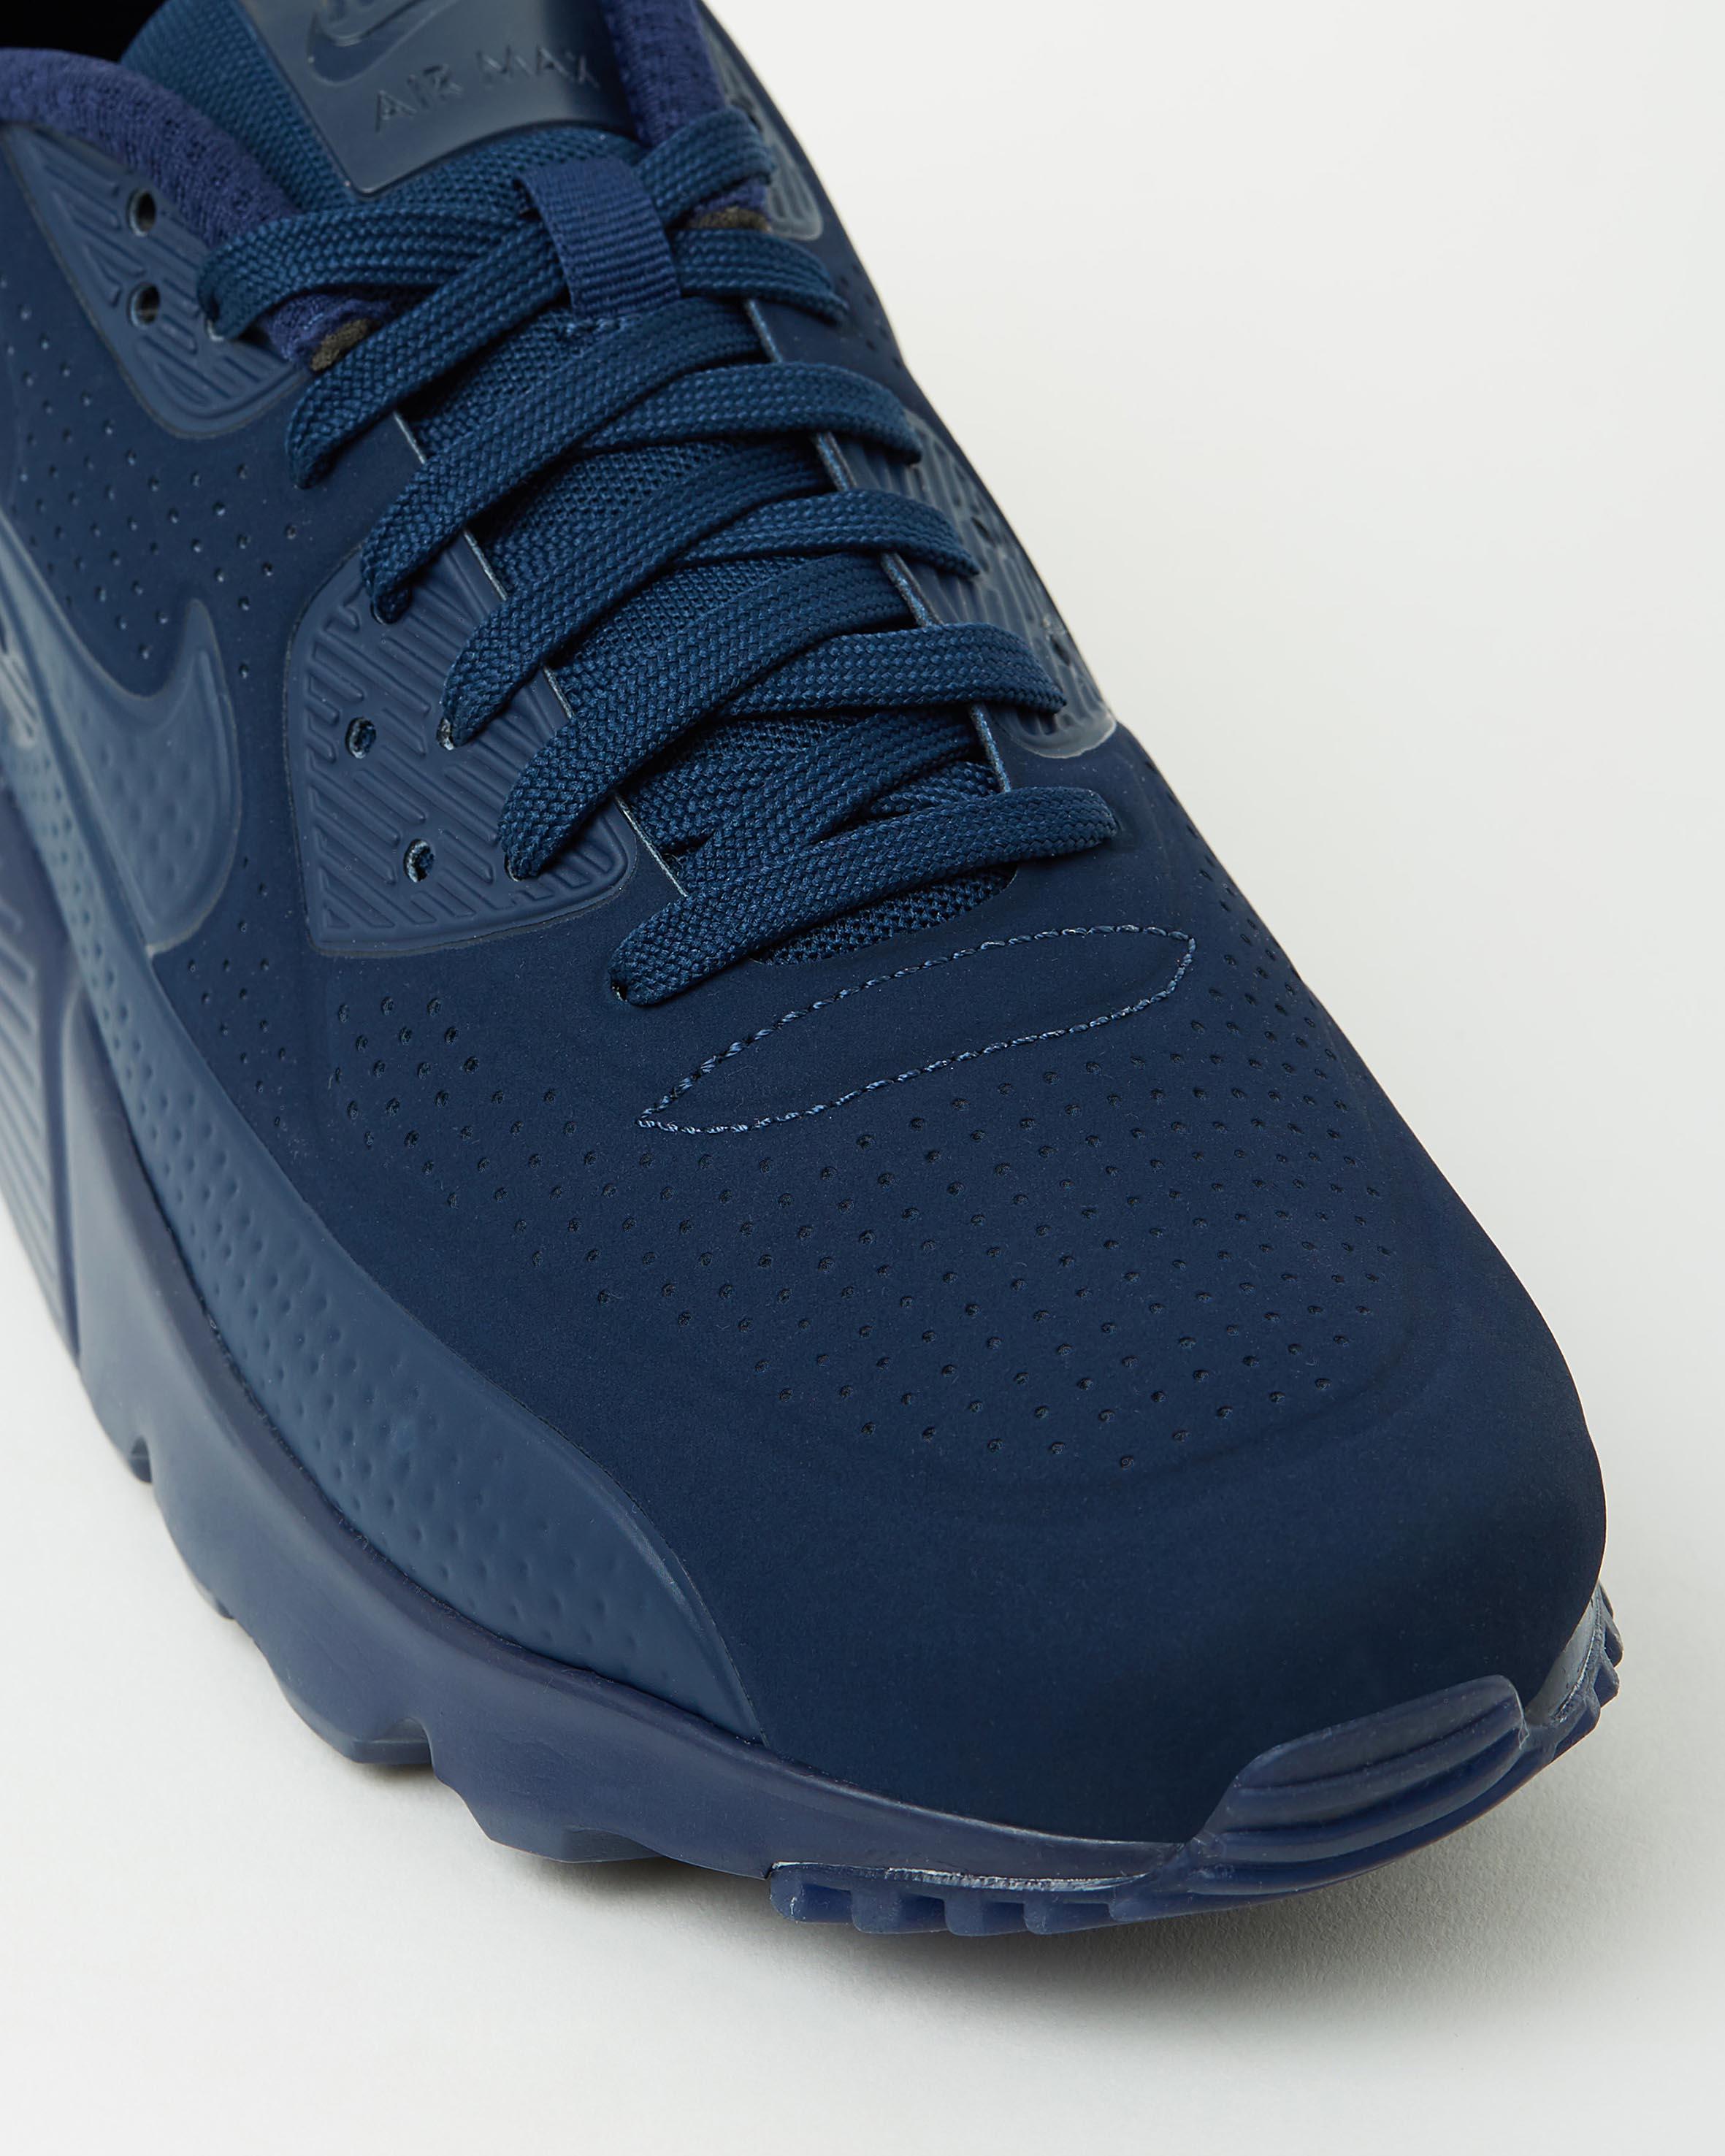 ce2a4506c059 ... Nike Air Max 90 Ultra Moire Midnight Blue 4